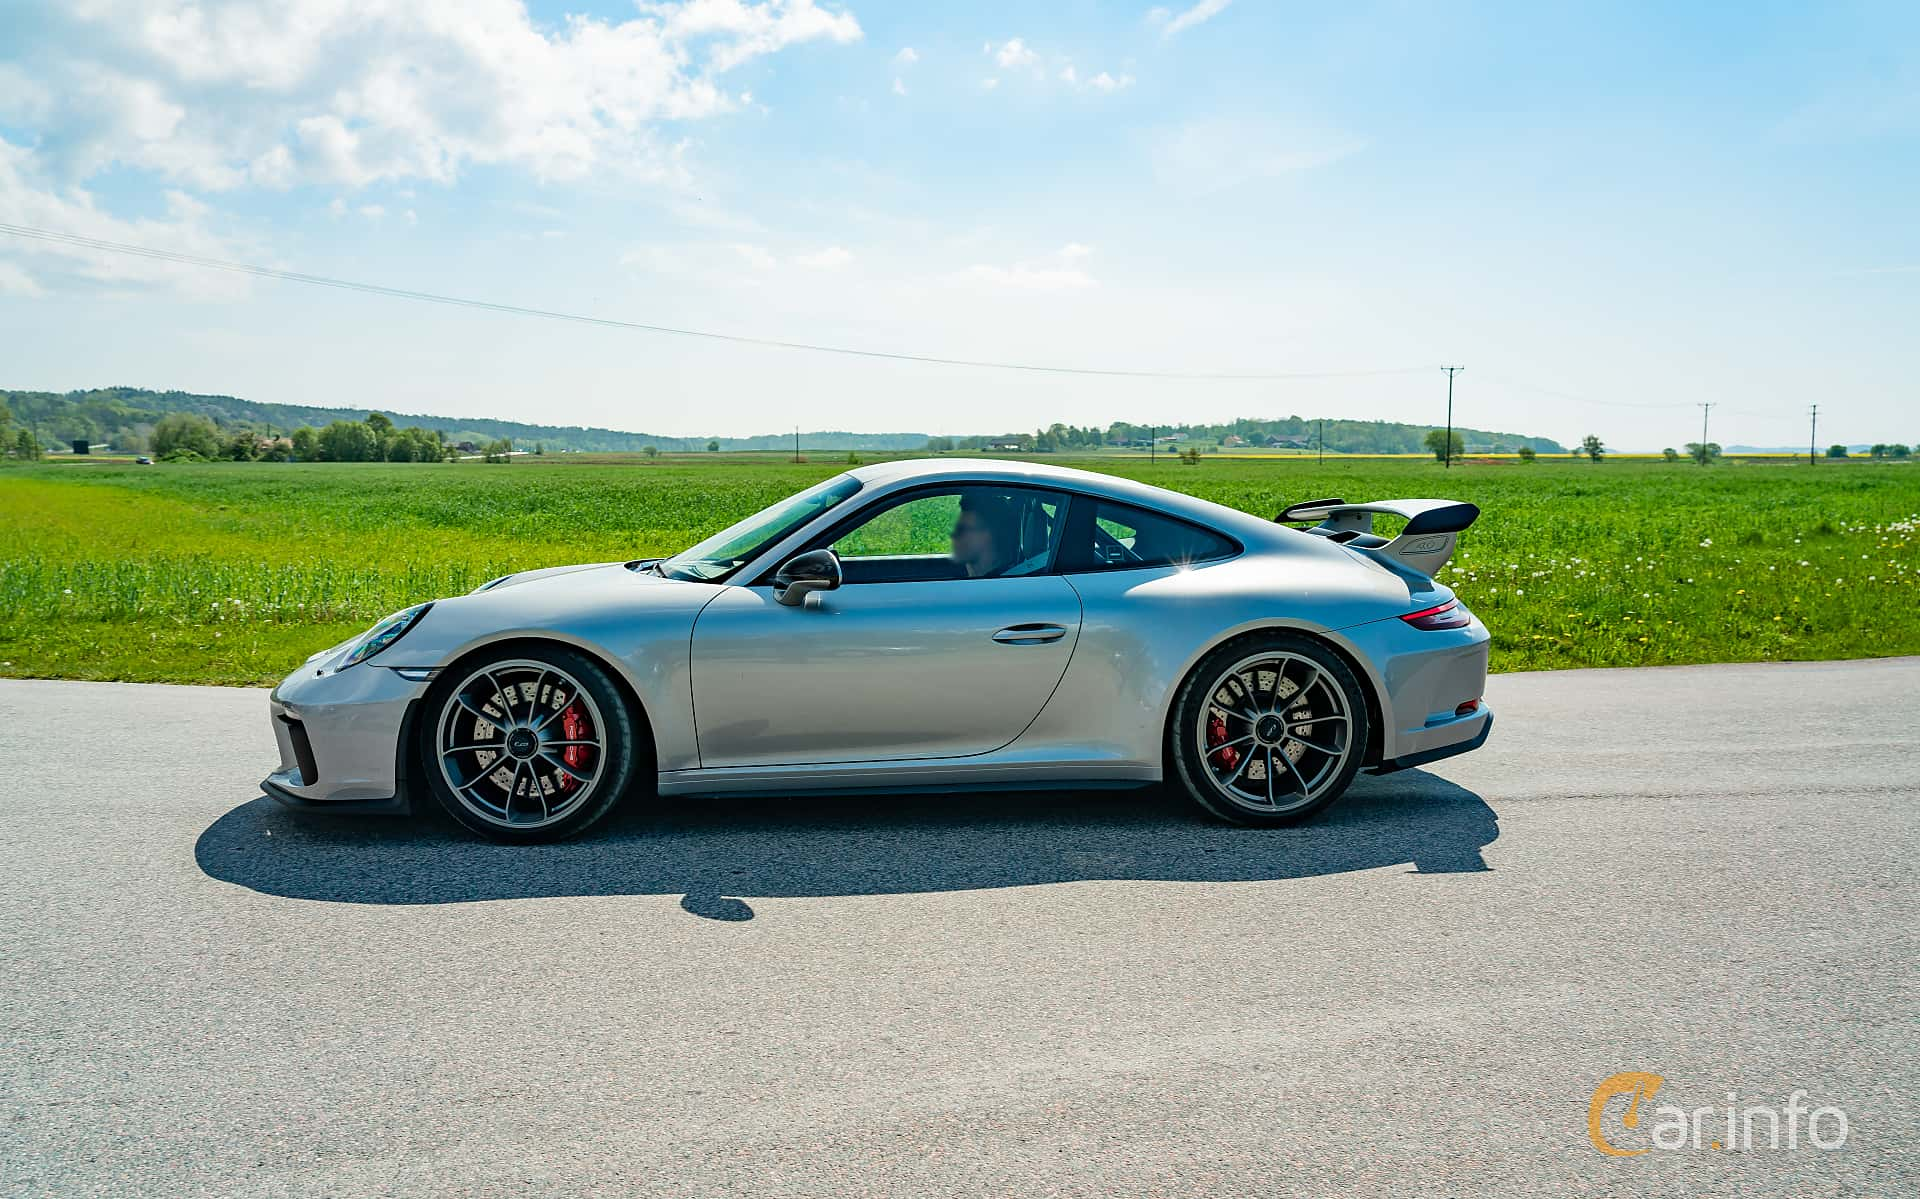 Porsche 911 GT3 4.0 H6 Manual, 500hp, 2018 at Tjolöholm Classic Motor 2019